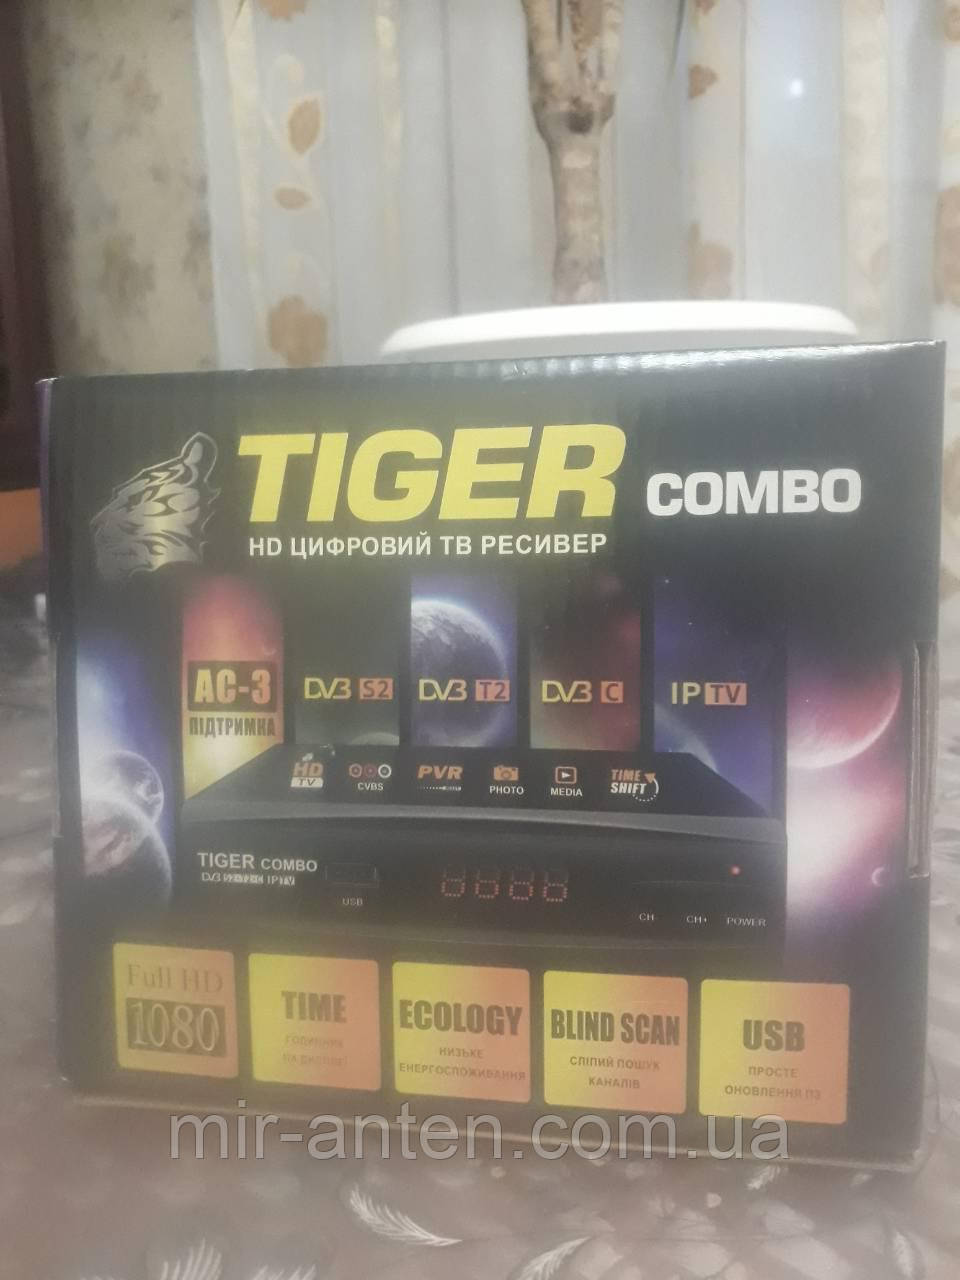 TIGER COMBO DVB-S2/T2/C